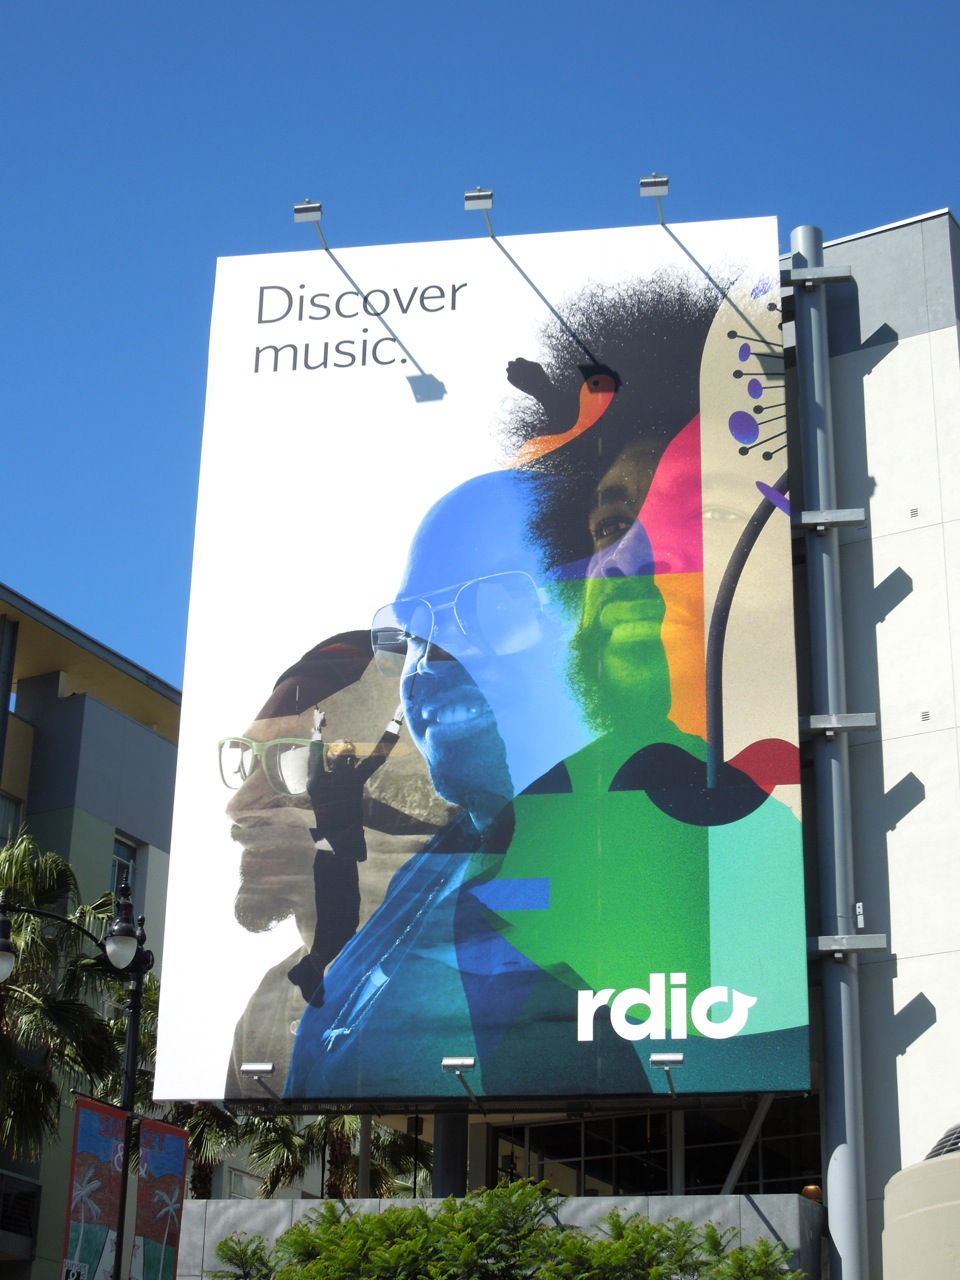 Daily Billboard: Rdio Human powered music discovery ...